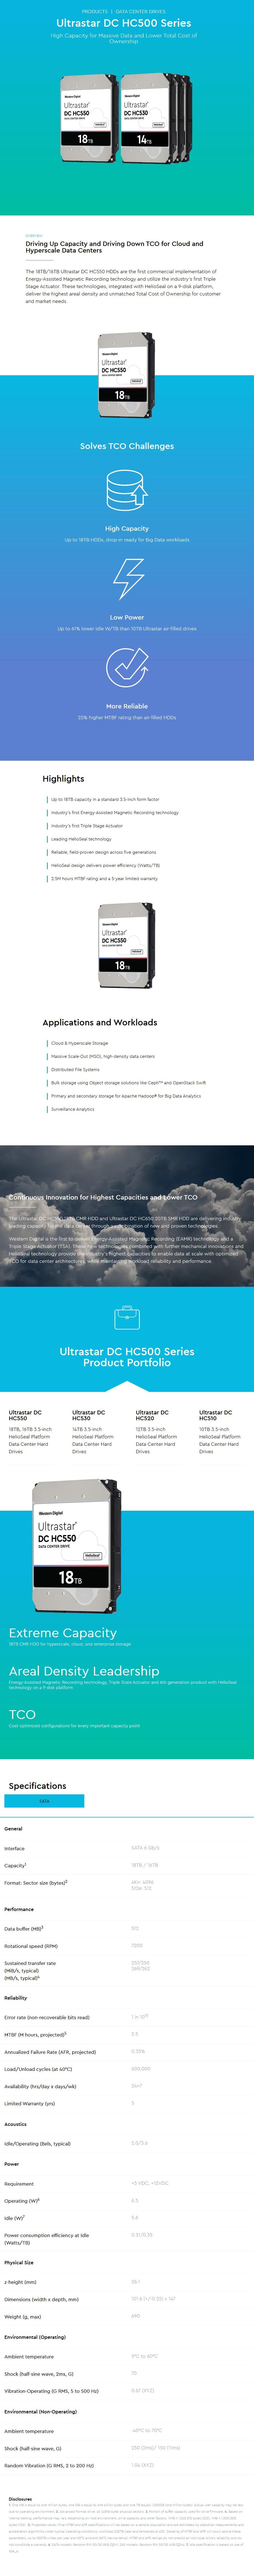 wd-ultrastar-dc-hc550-16tb-35-512e4kn-sata-7200rpm-hard-drive-0f38462-ac37574-1.jpg